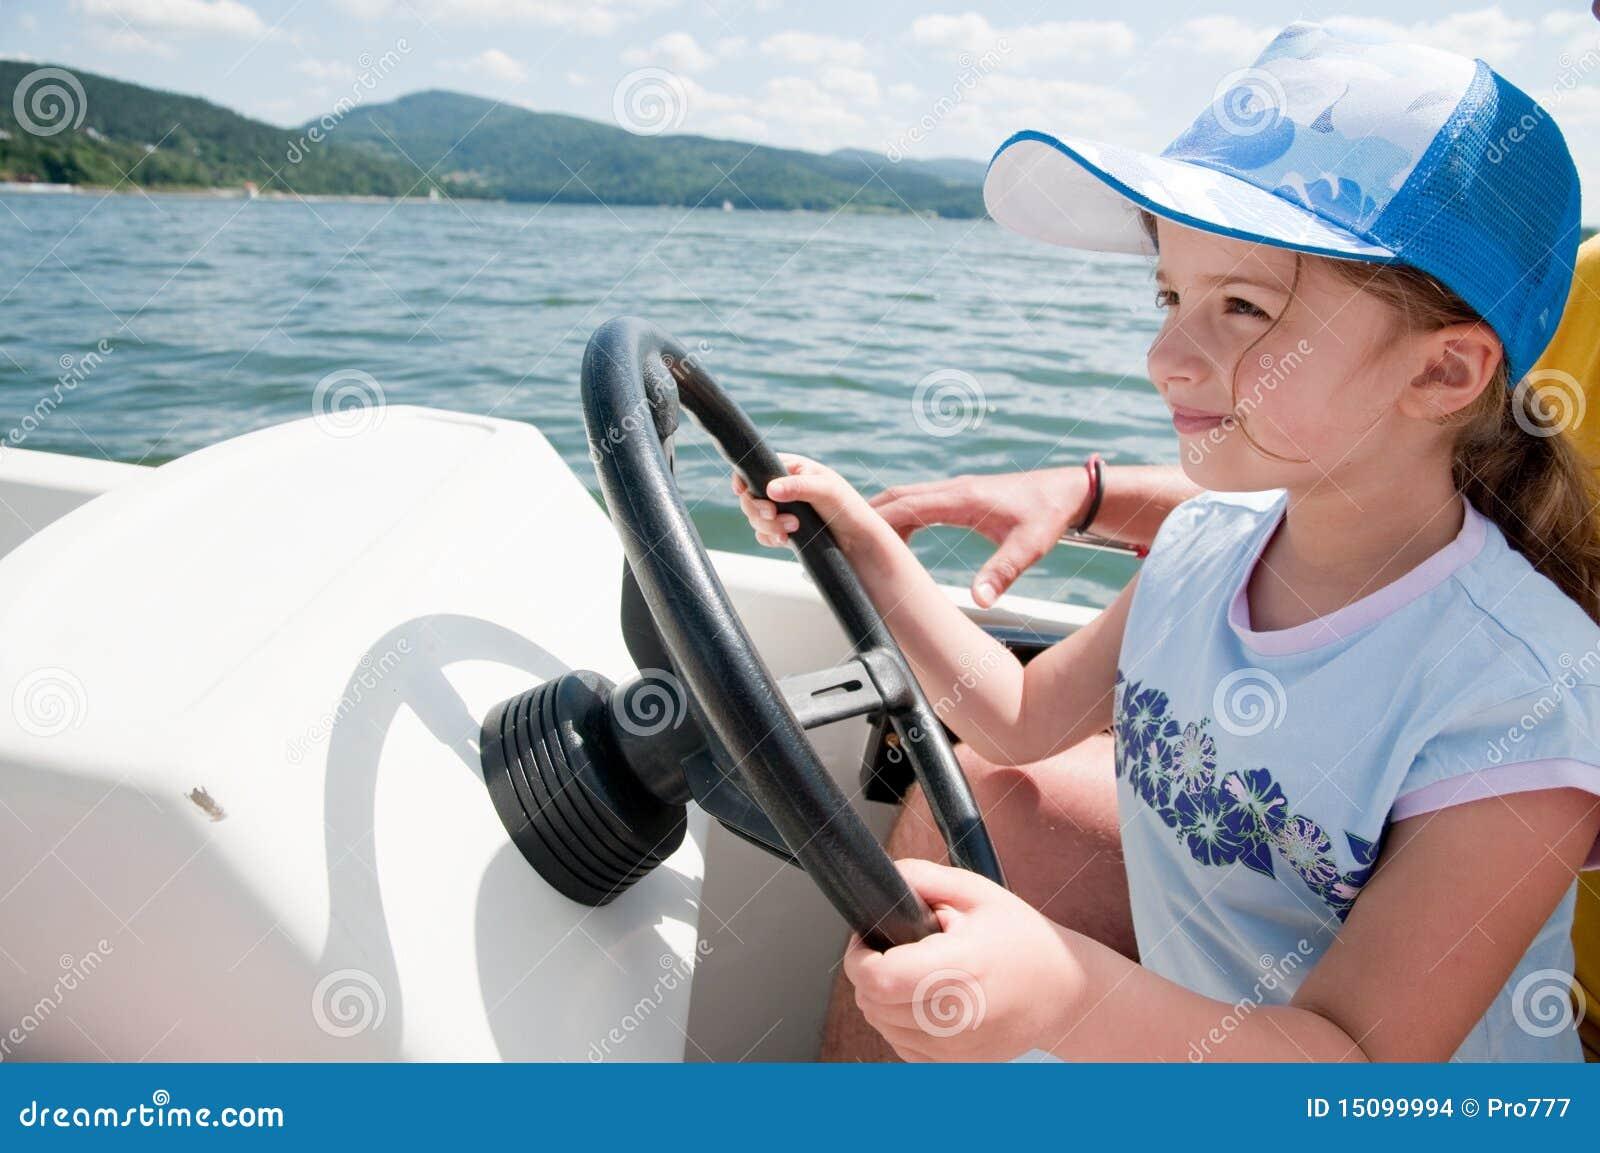 Little girl on motorboat